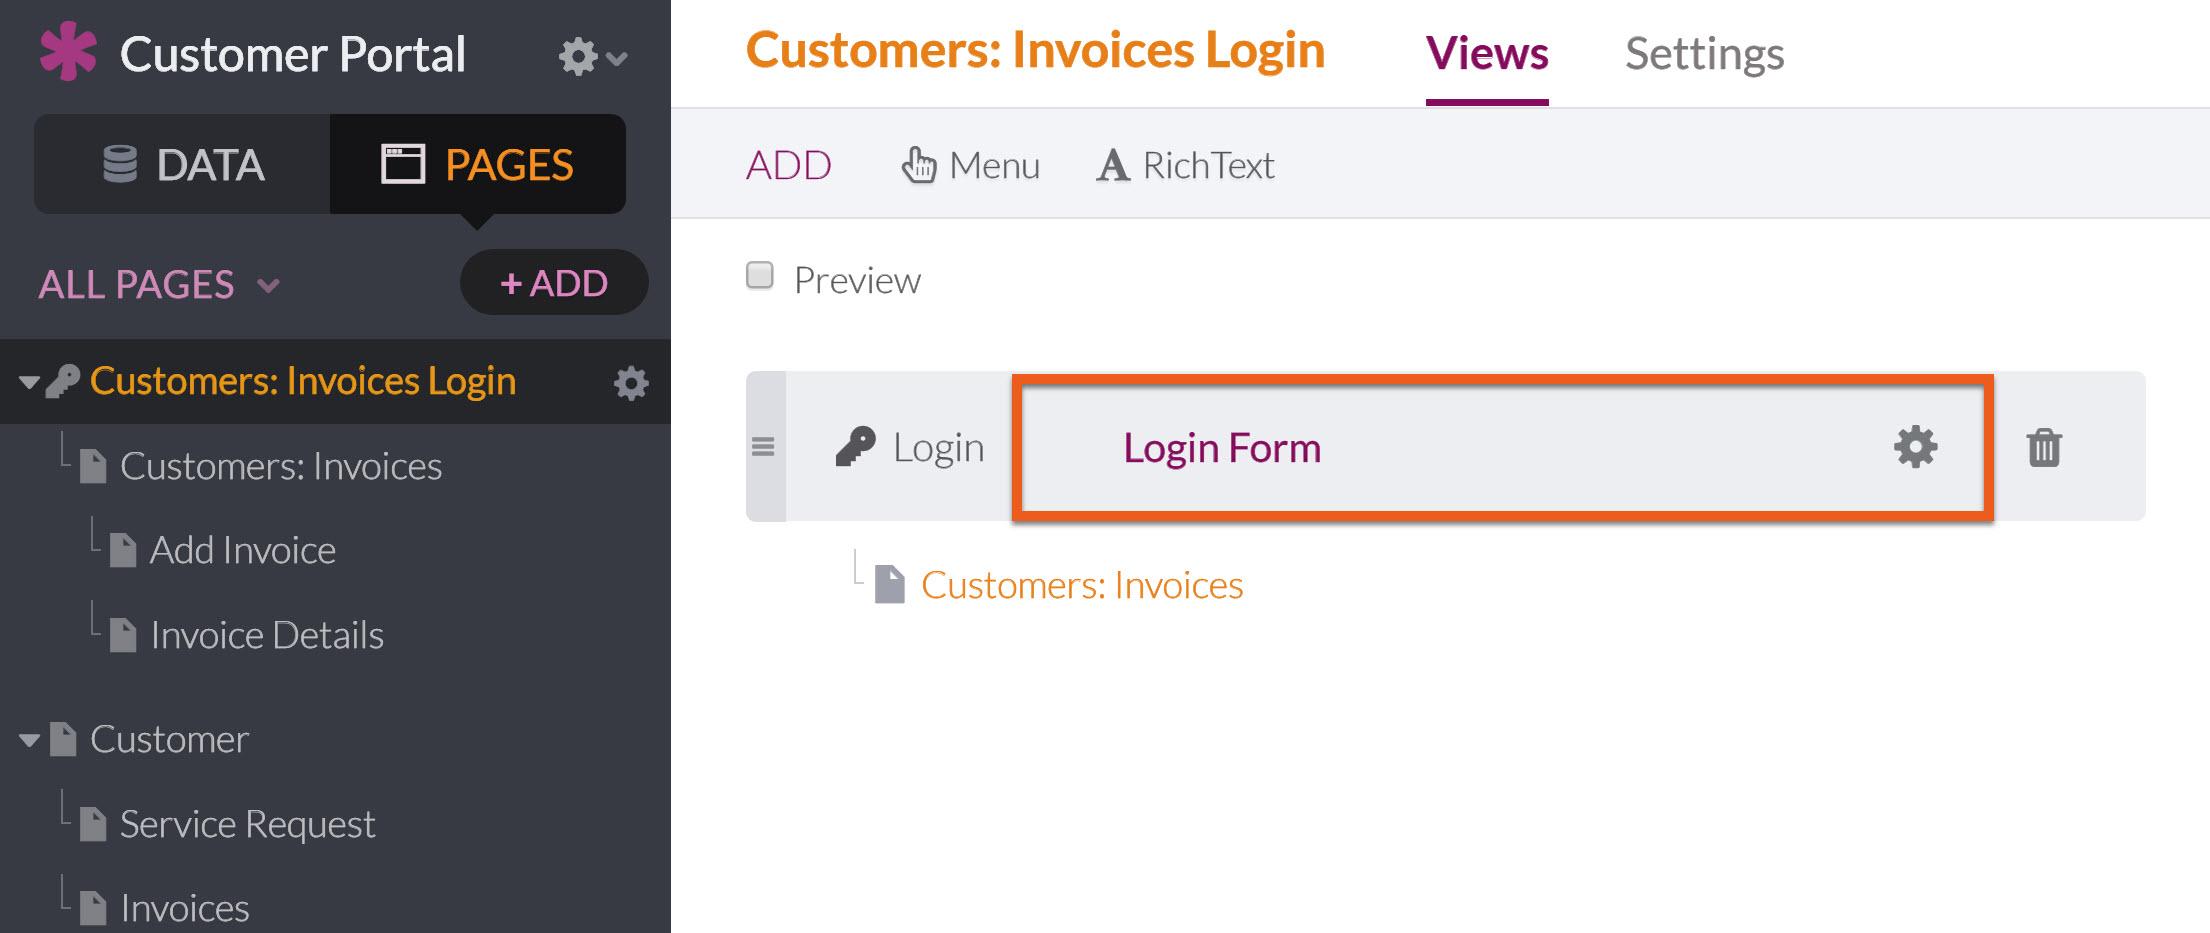 Logins And Registrations Knack - Open invoice login